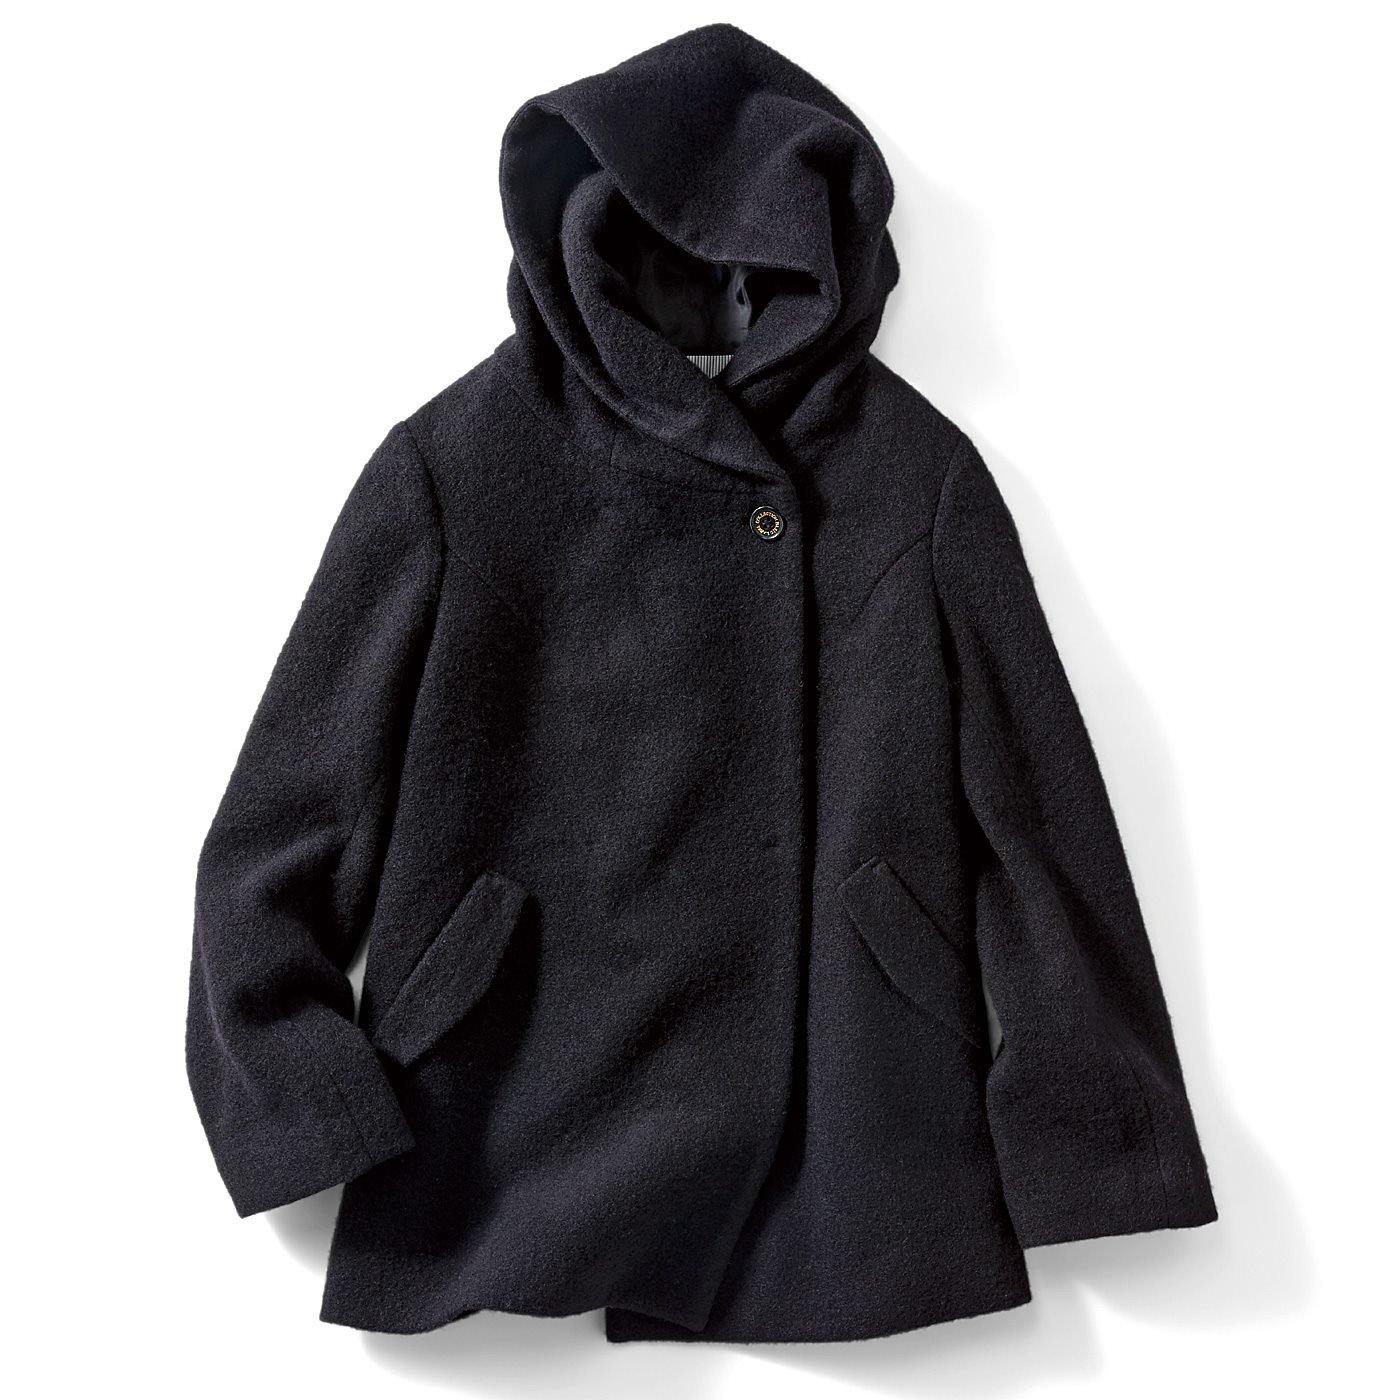 IEDIT ウールがたっぷり入って暖か スライバーニット素材の軽やかフーデッドショート丈コート〈ブラック〉